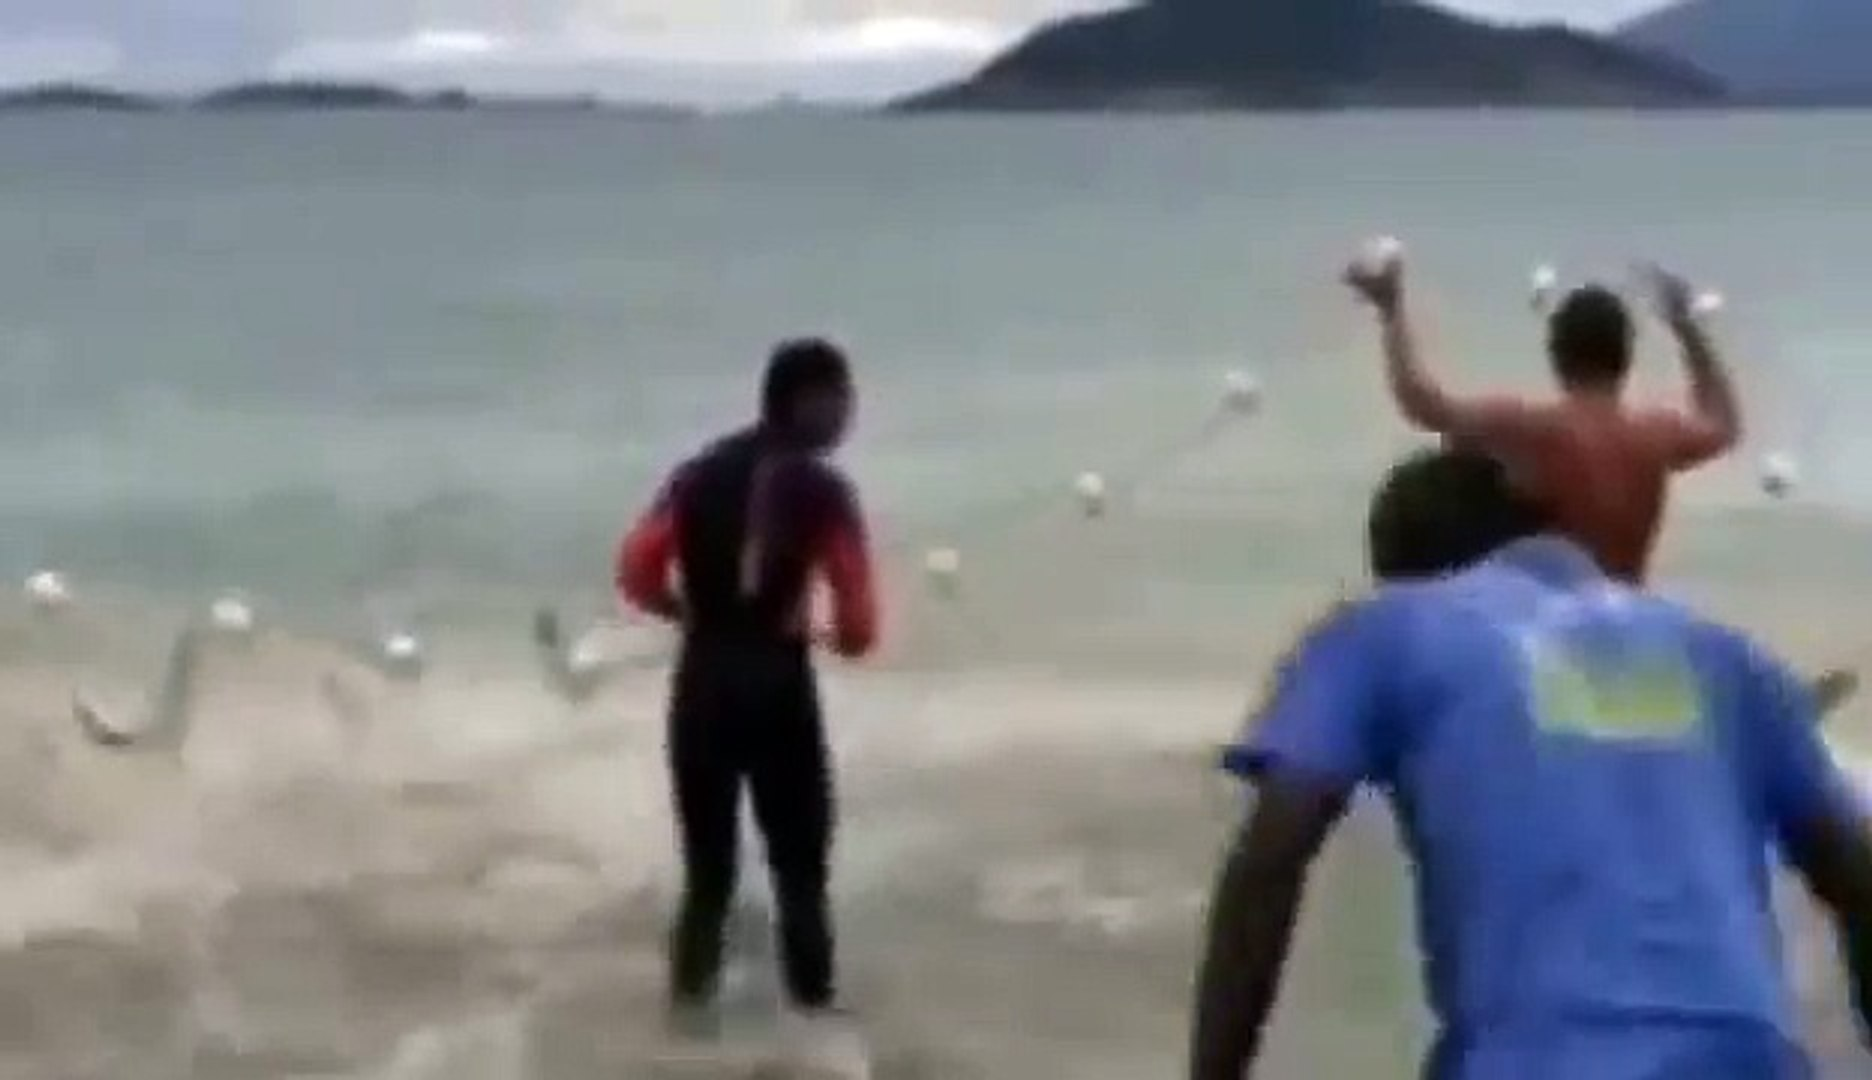 Pesca da Tainha.   Кефаль,Рыбалка